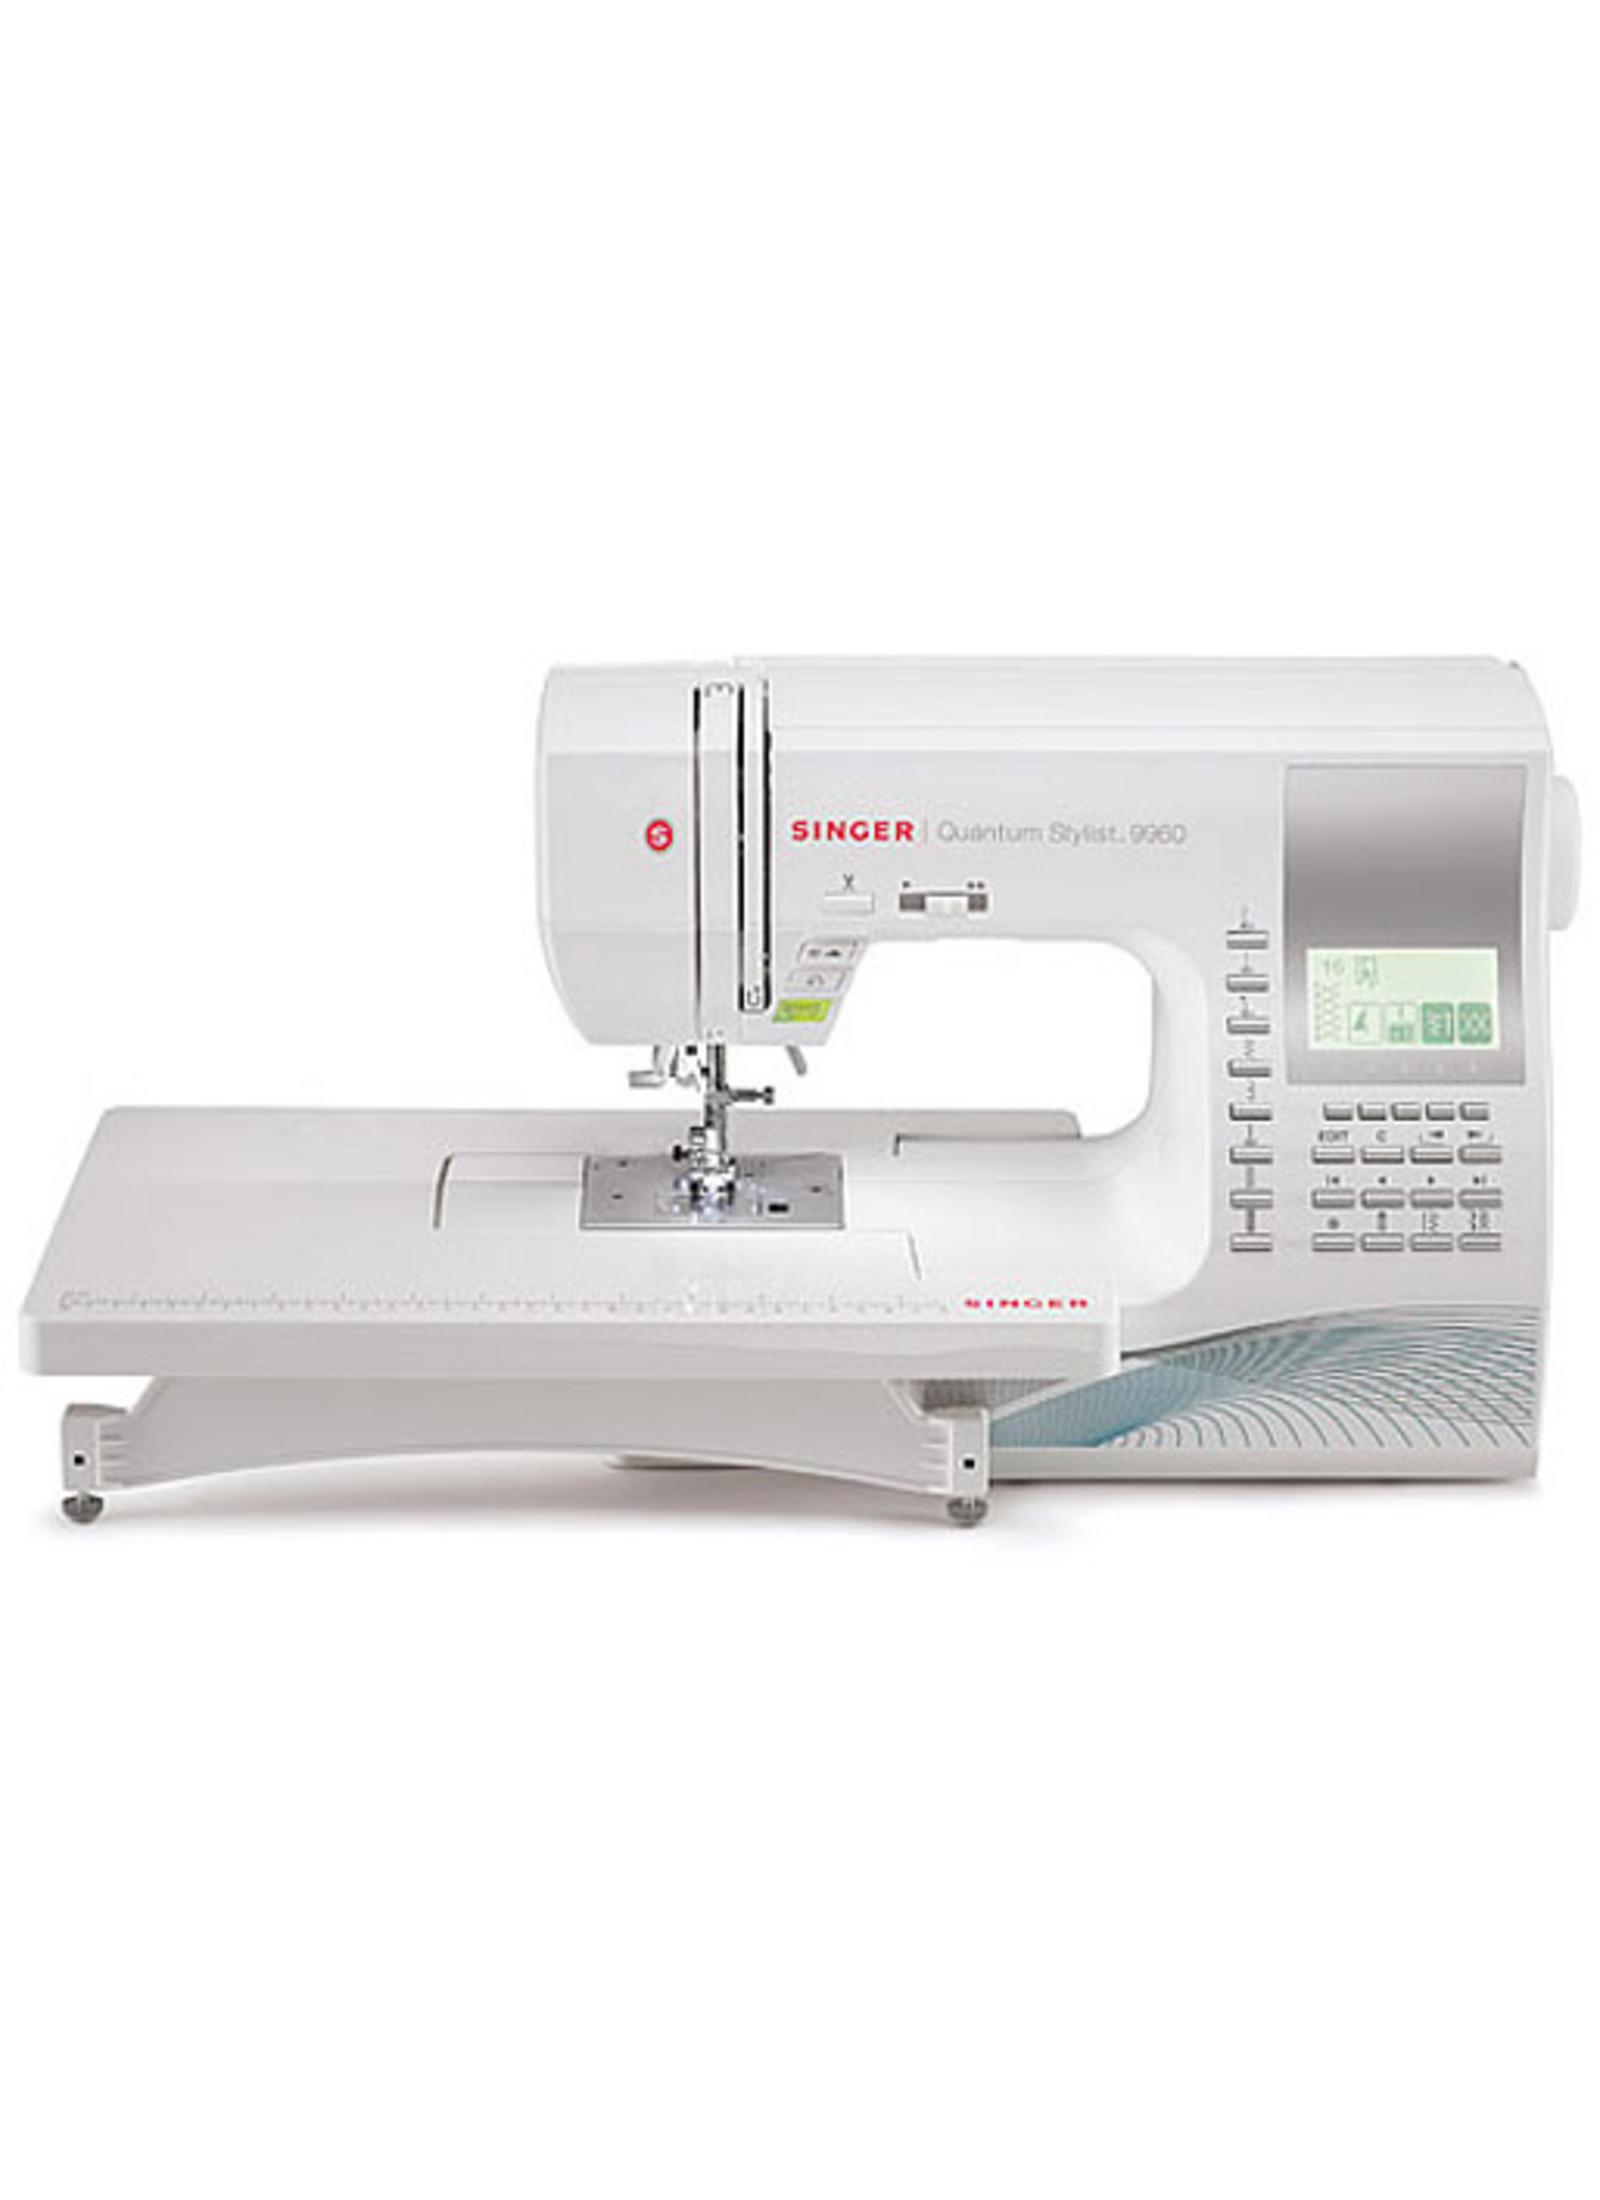 Singer 9960 Quantum Stylist Sewing Machine Reg $899.99 Now $649.99 No Taxes!